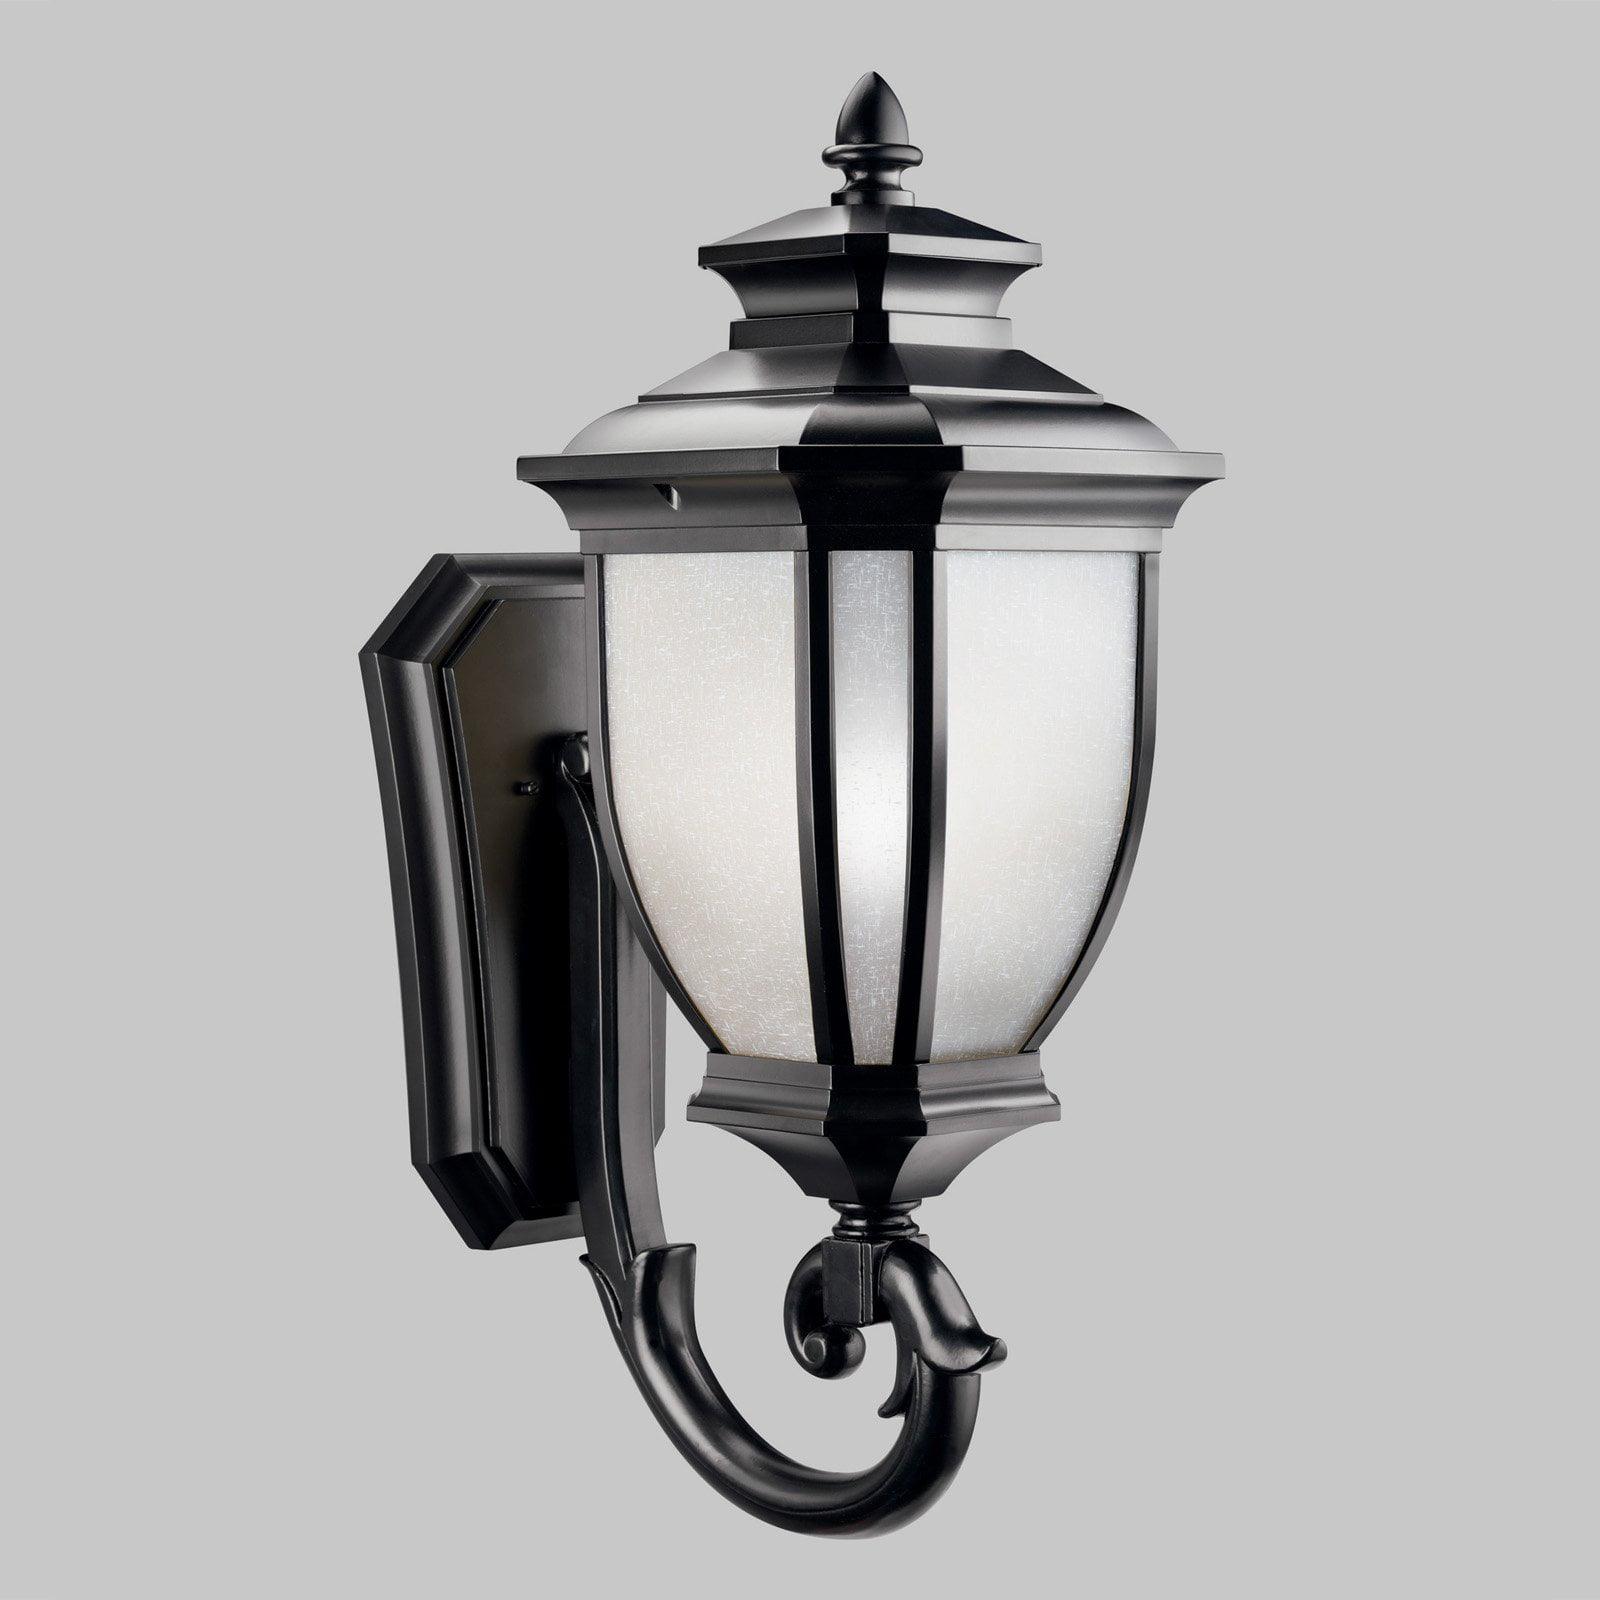 Kichler Salisbury 9043 Outdoor Wall Lantern - 12 in.